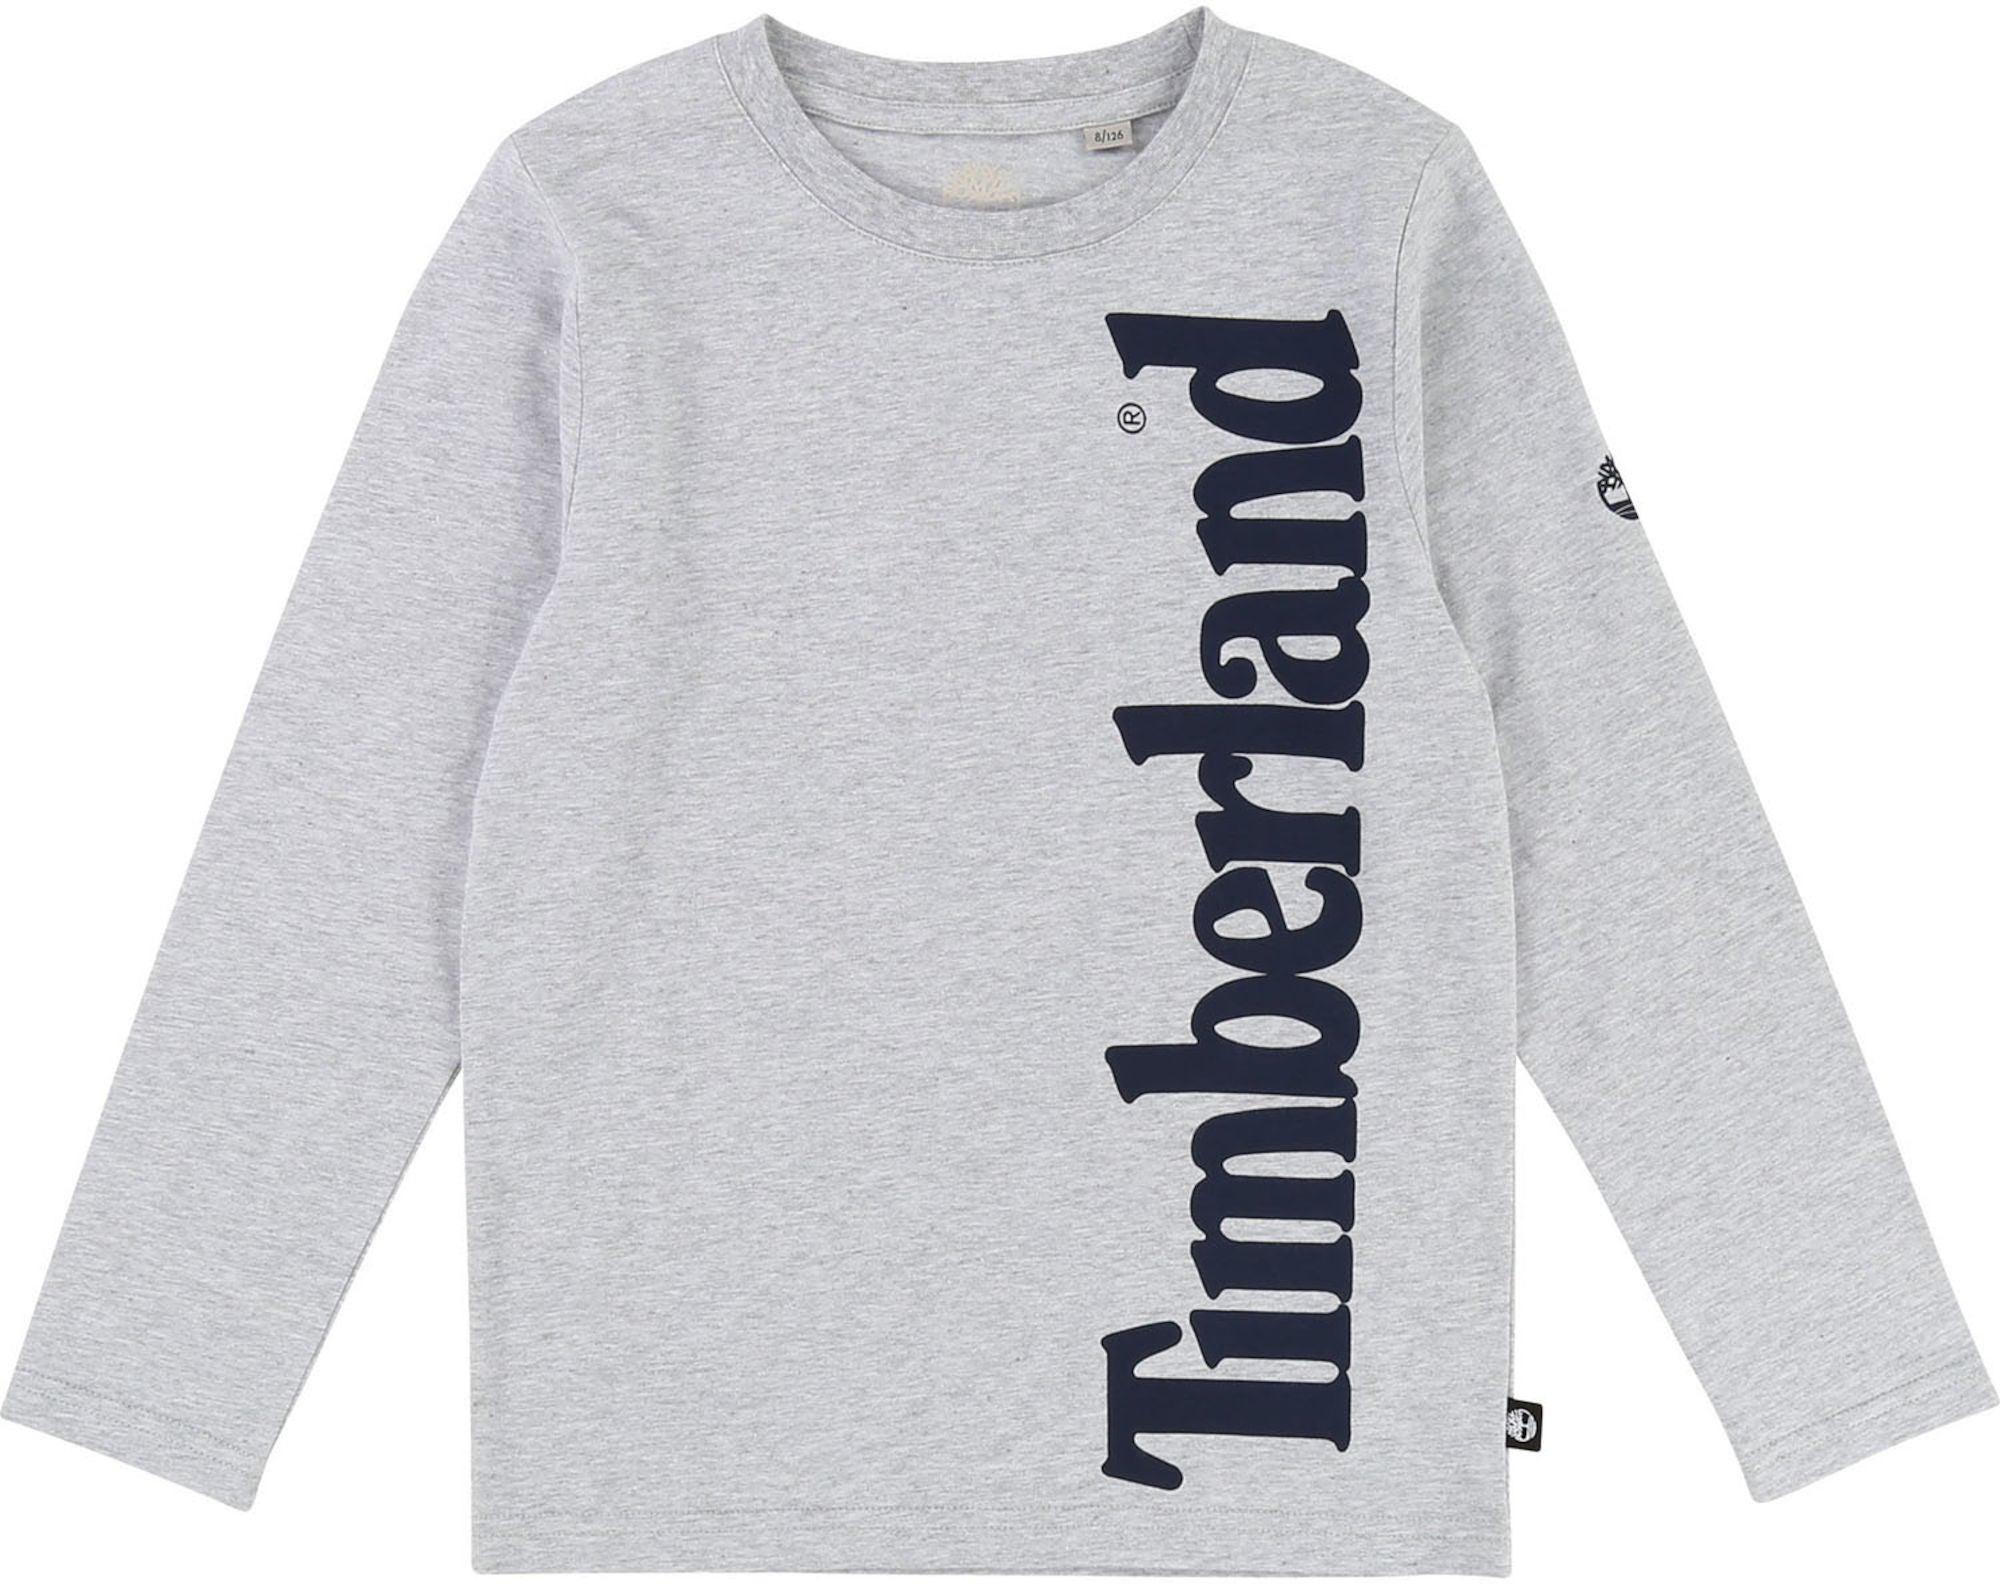 77e34549a89 Köp Timberland Långärmad T-Shirt, Chine Grey   Jollyroom